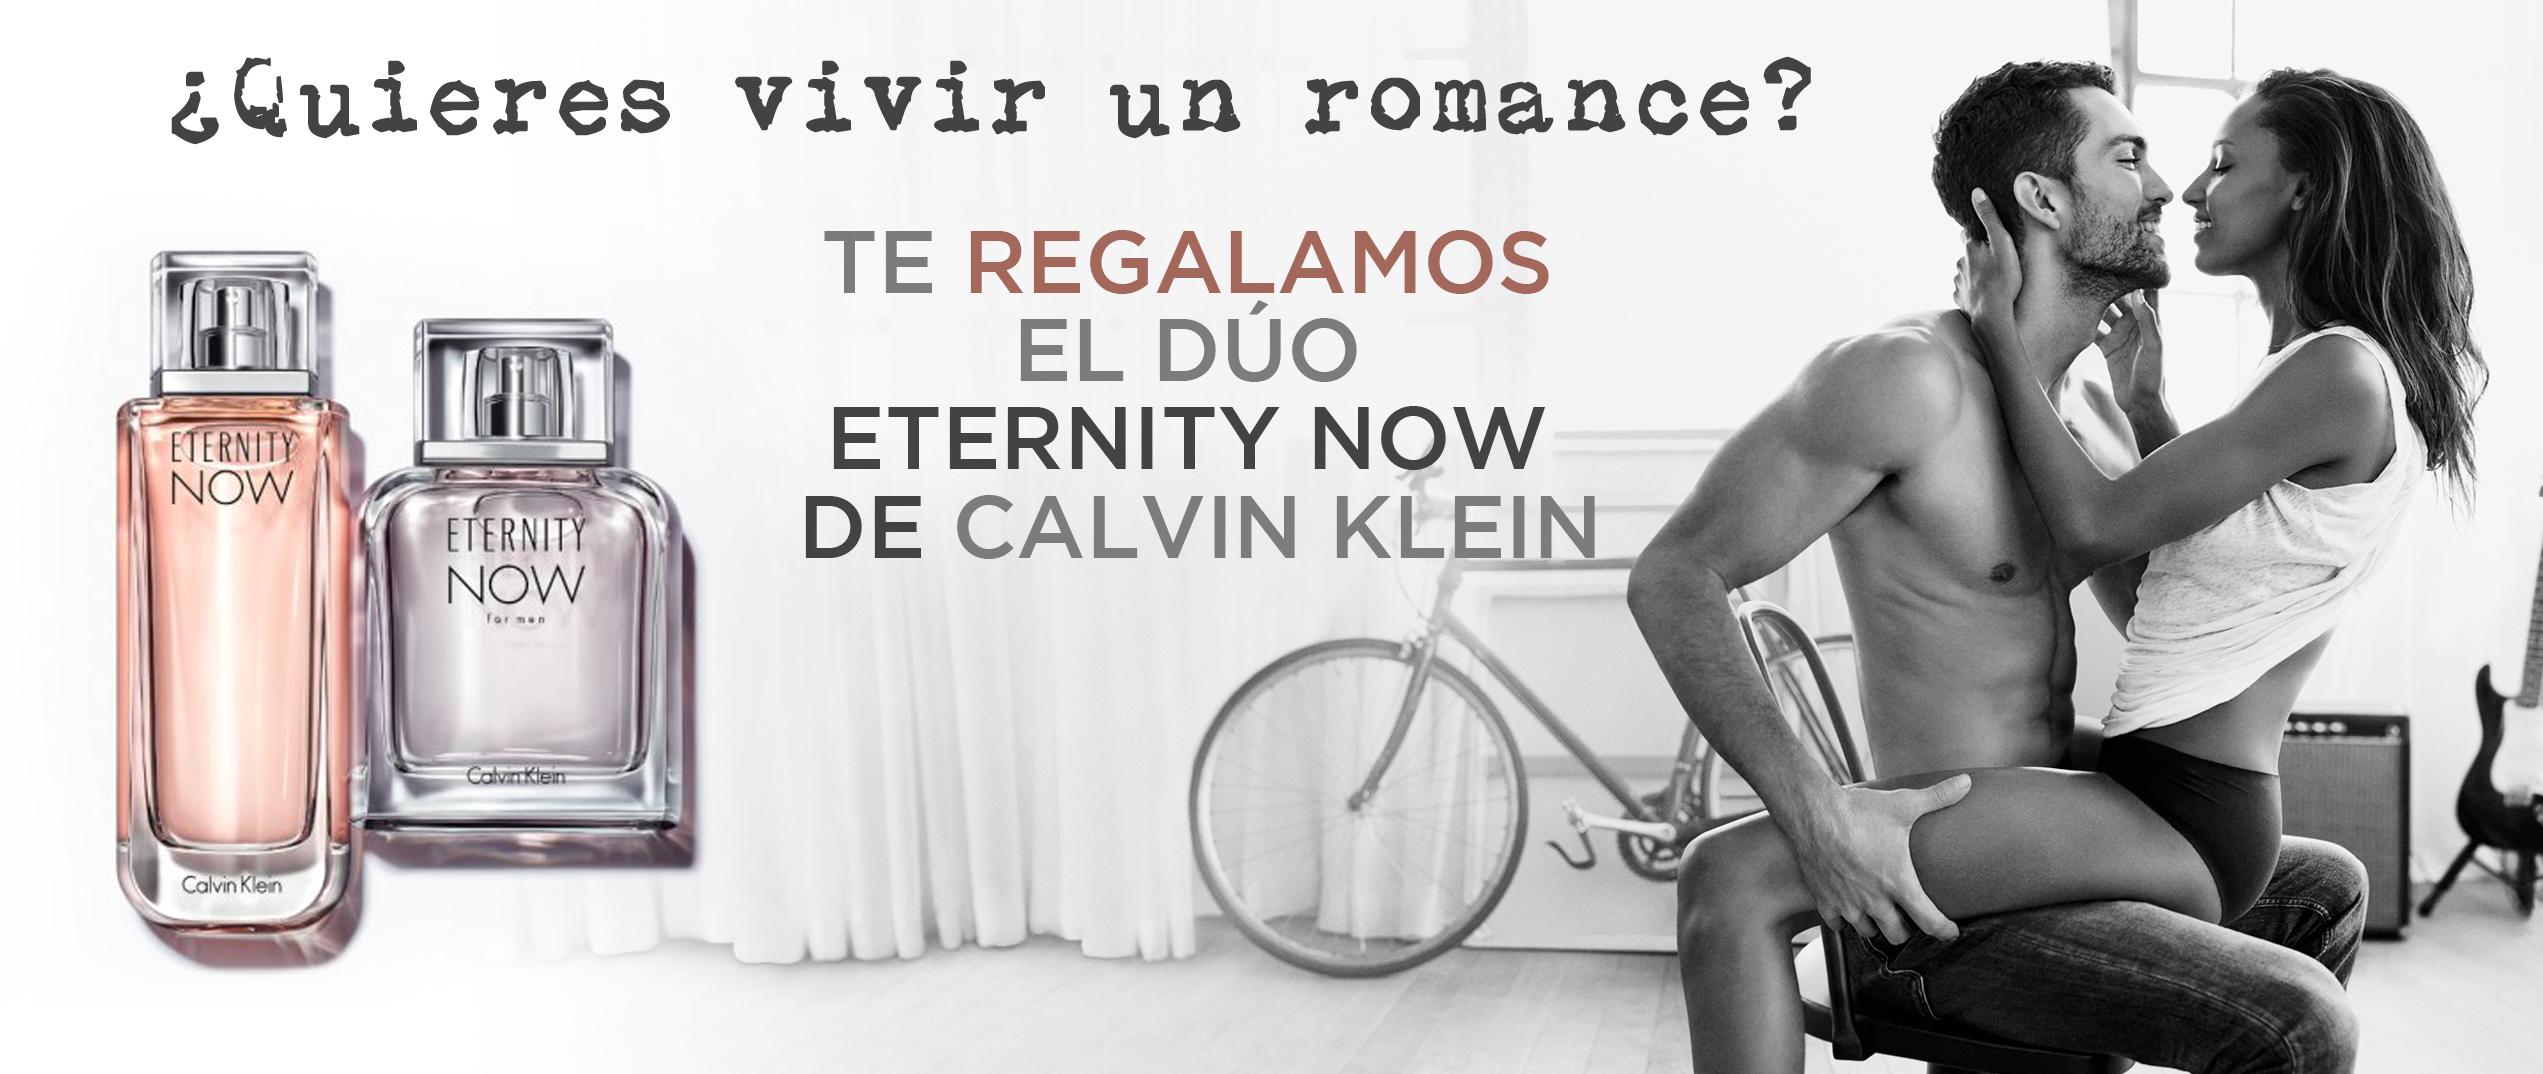 Eternity, de Calvin Klein